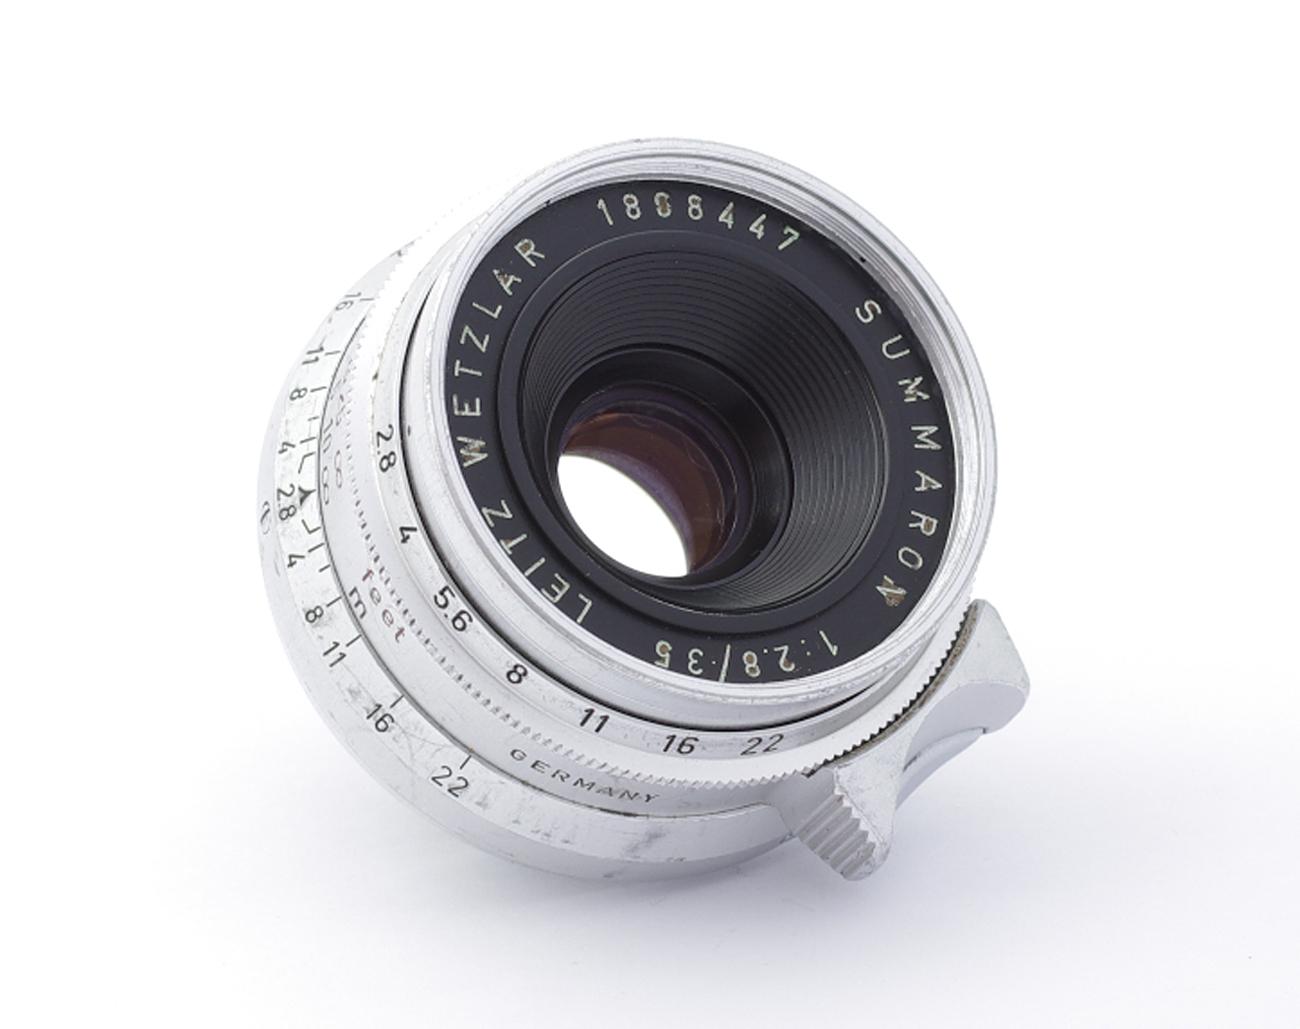 Leica-SM-Summaron-2-8-35-mm-1808447-Germany-LTM-L39-Lens Indexbild 2